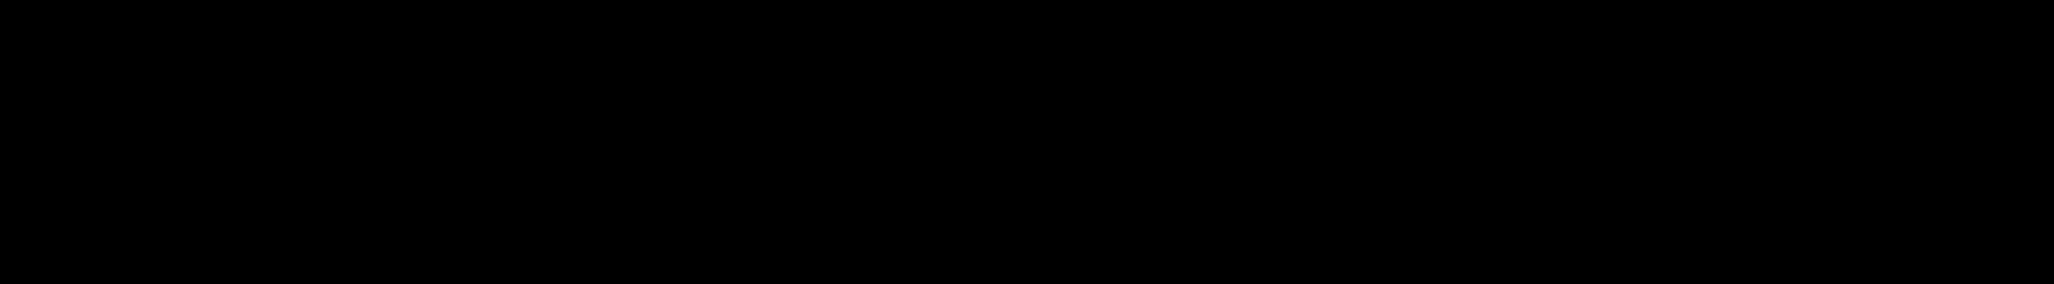 Zenaudio company logo dark 2x copy